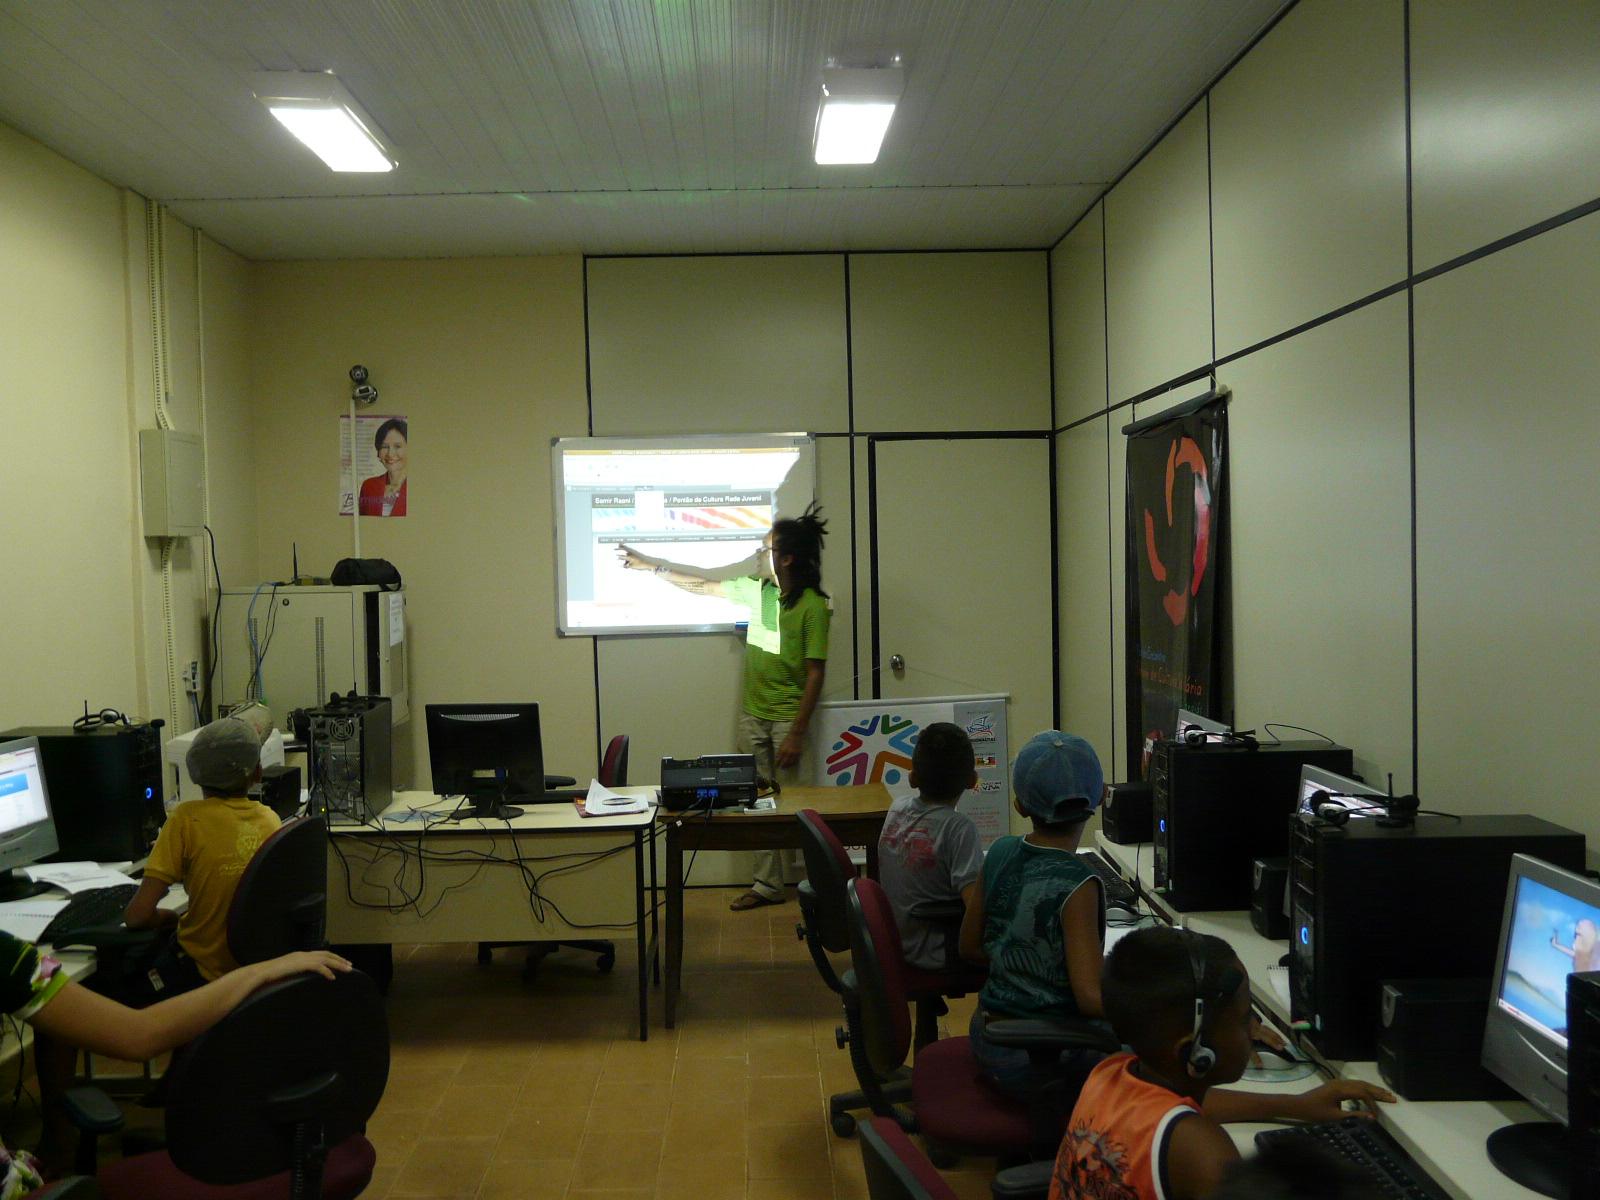 Oficina de Web 2.0 - A Internet Colaborativa